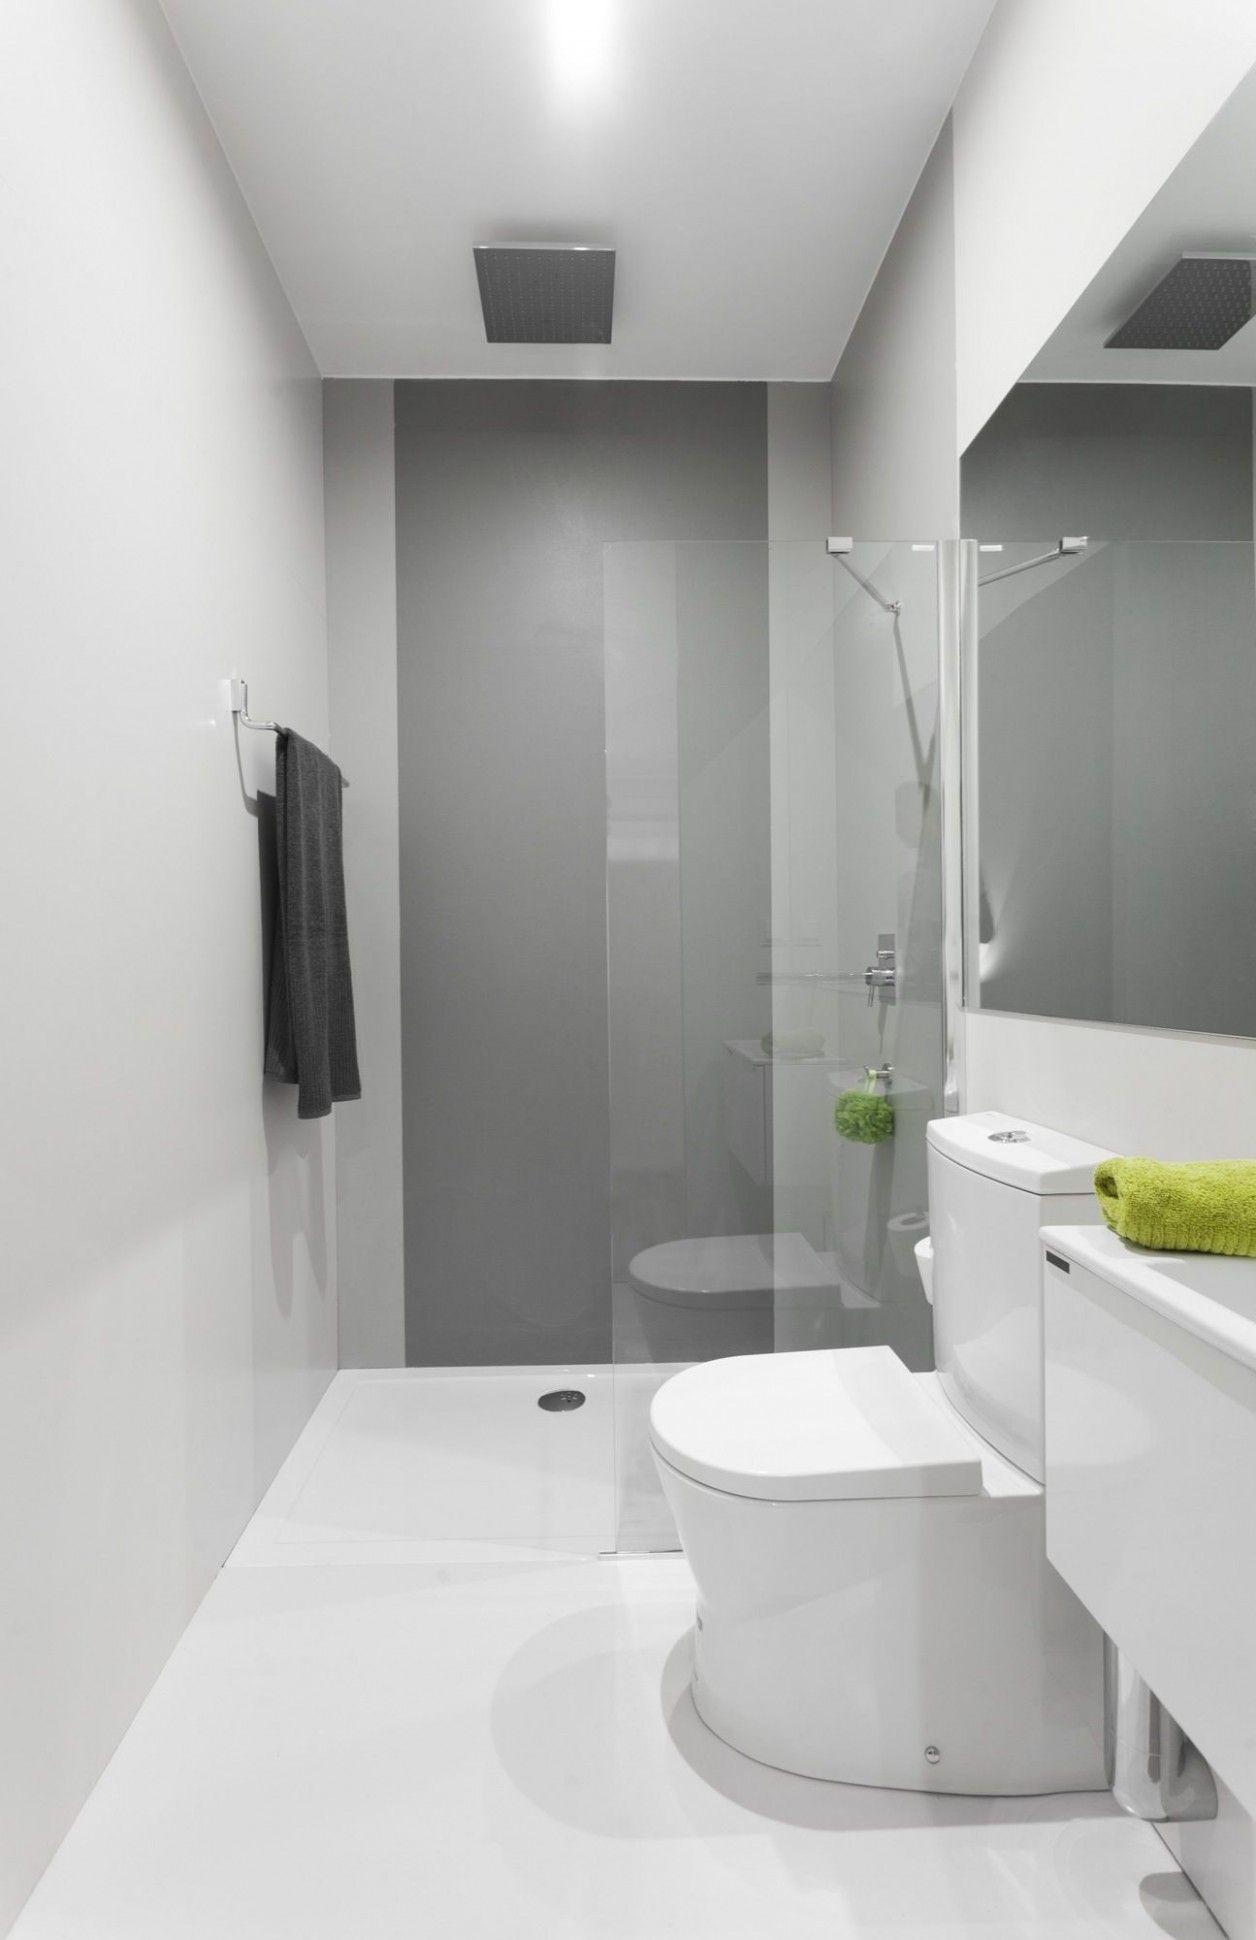 Size Of A Small Bathroom Design Ide Kamar Mandi Kamar Mandi Kecil Rumah